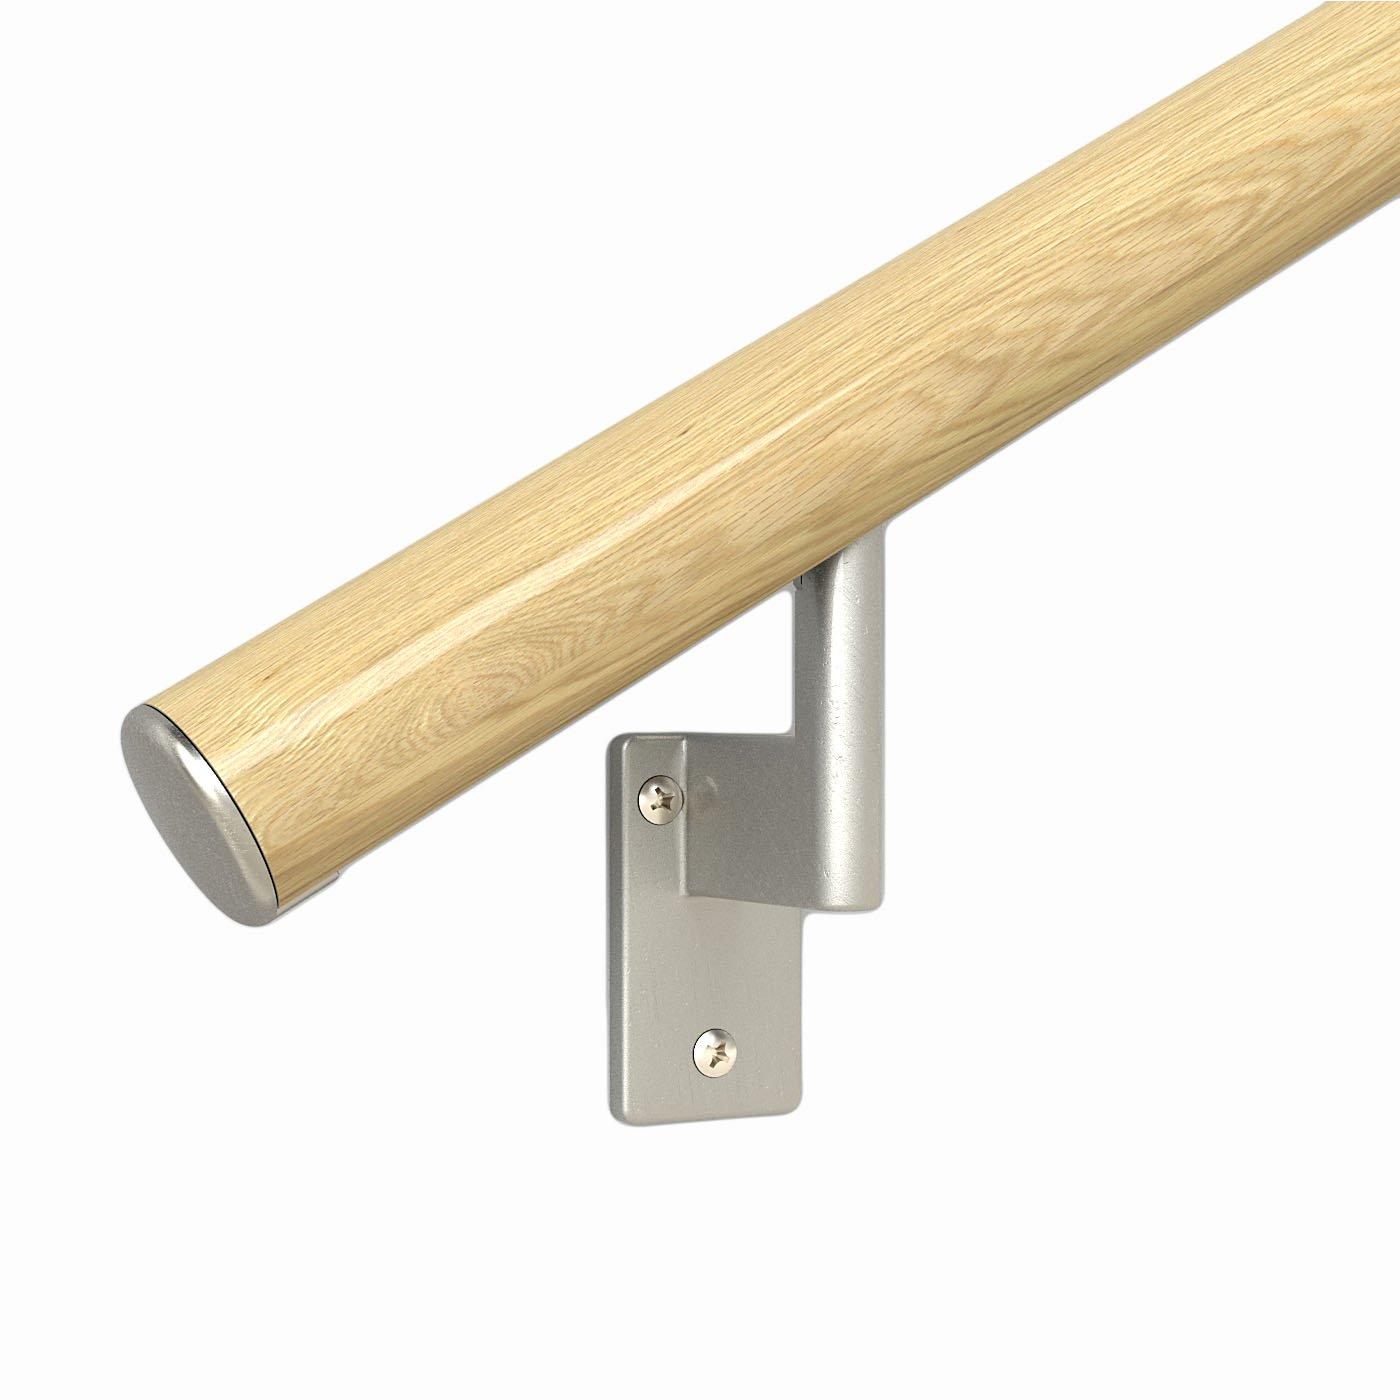 5 ft. Handrail - Complete Kit. Genuine Red Oak Bonded to Aluminum Core, 3 Matte Nickel Brackets + Flush Endcaps, 1.6'' Round by PROMENAID